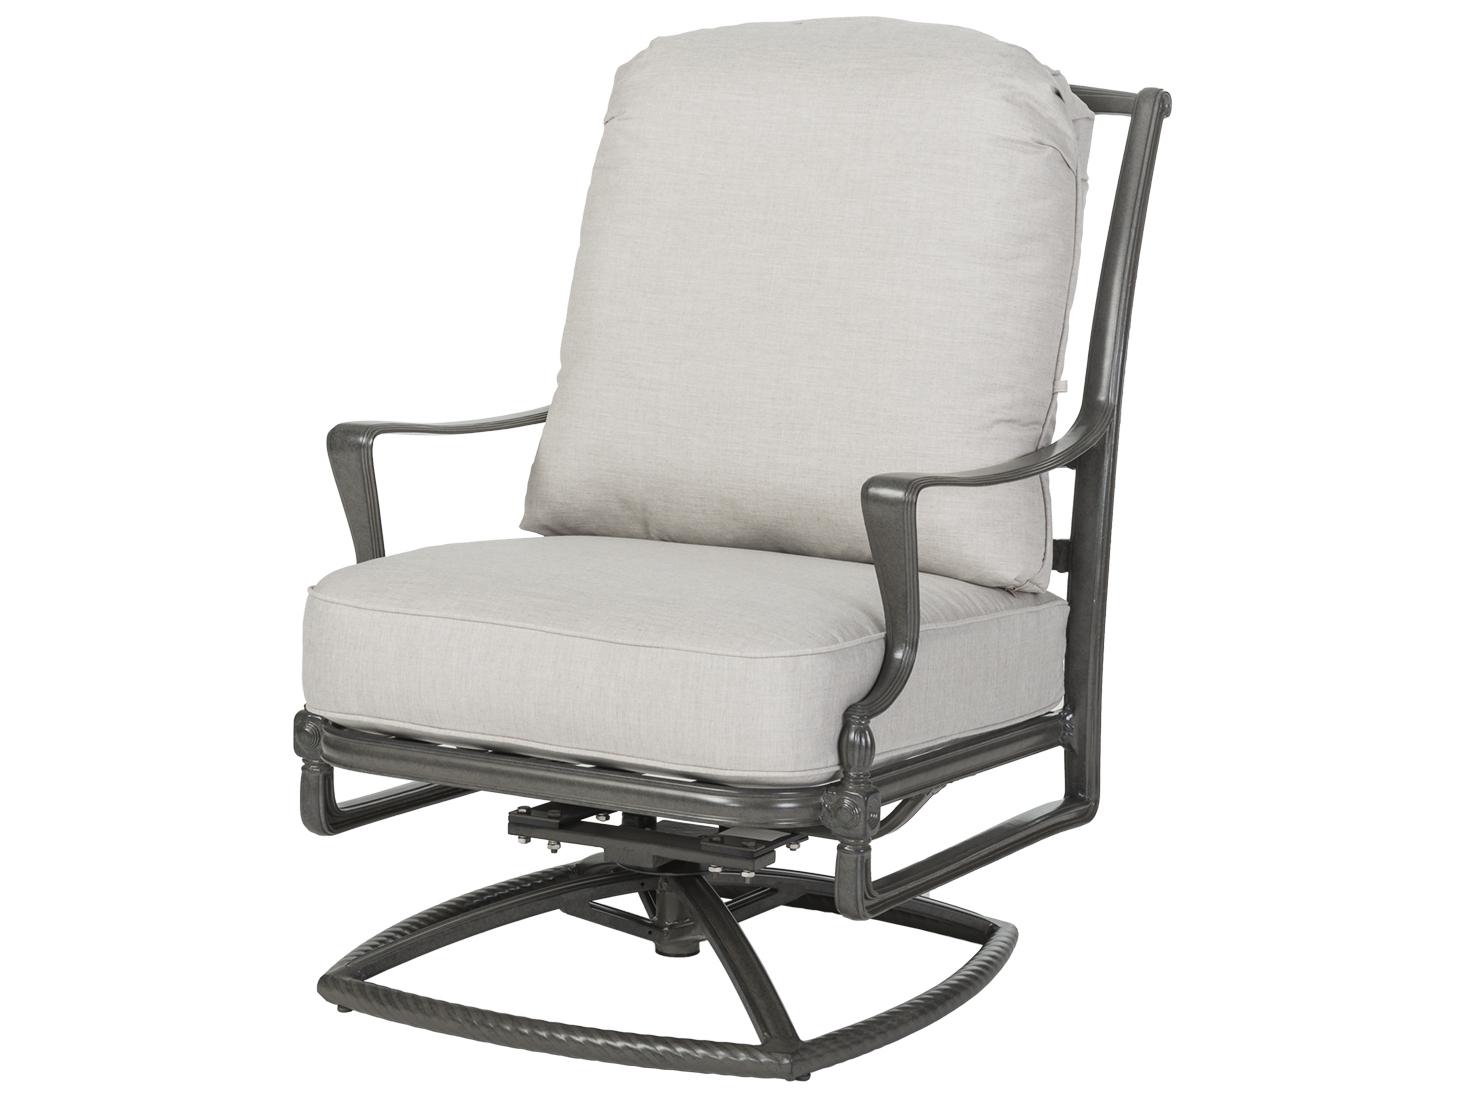 air sofa rocking chair with speaker pizza hut gensun bel cast aluminum cushion high back swivel